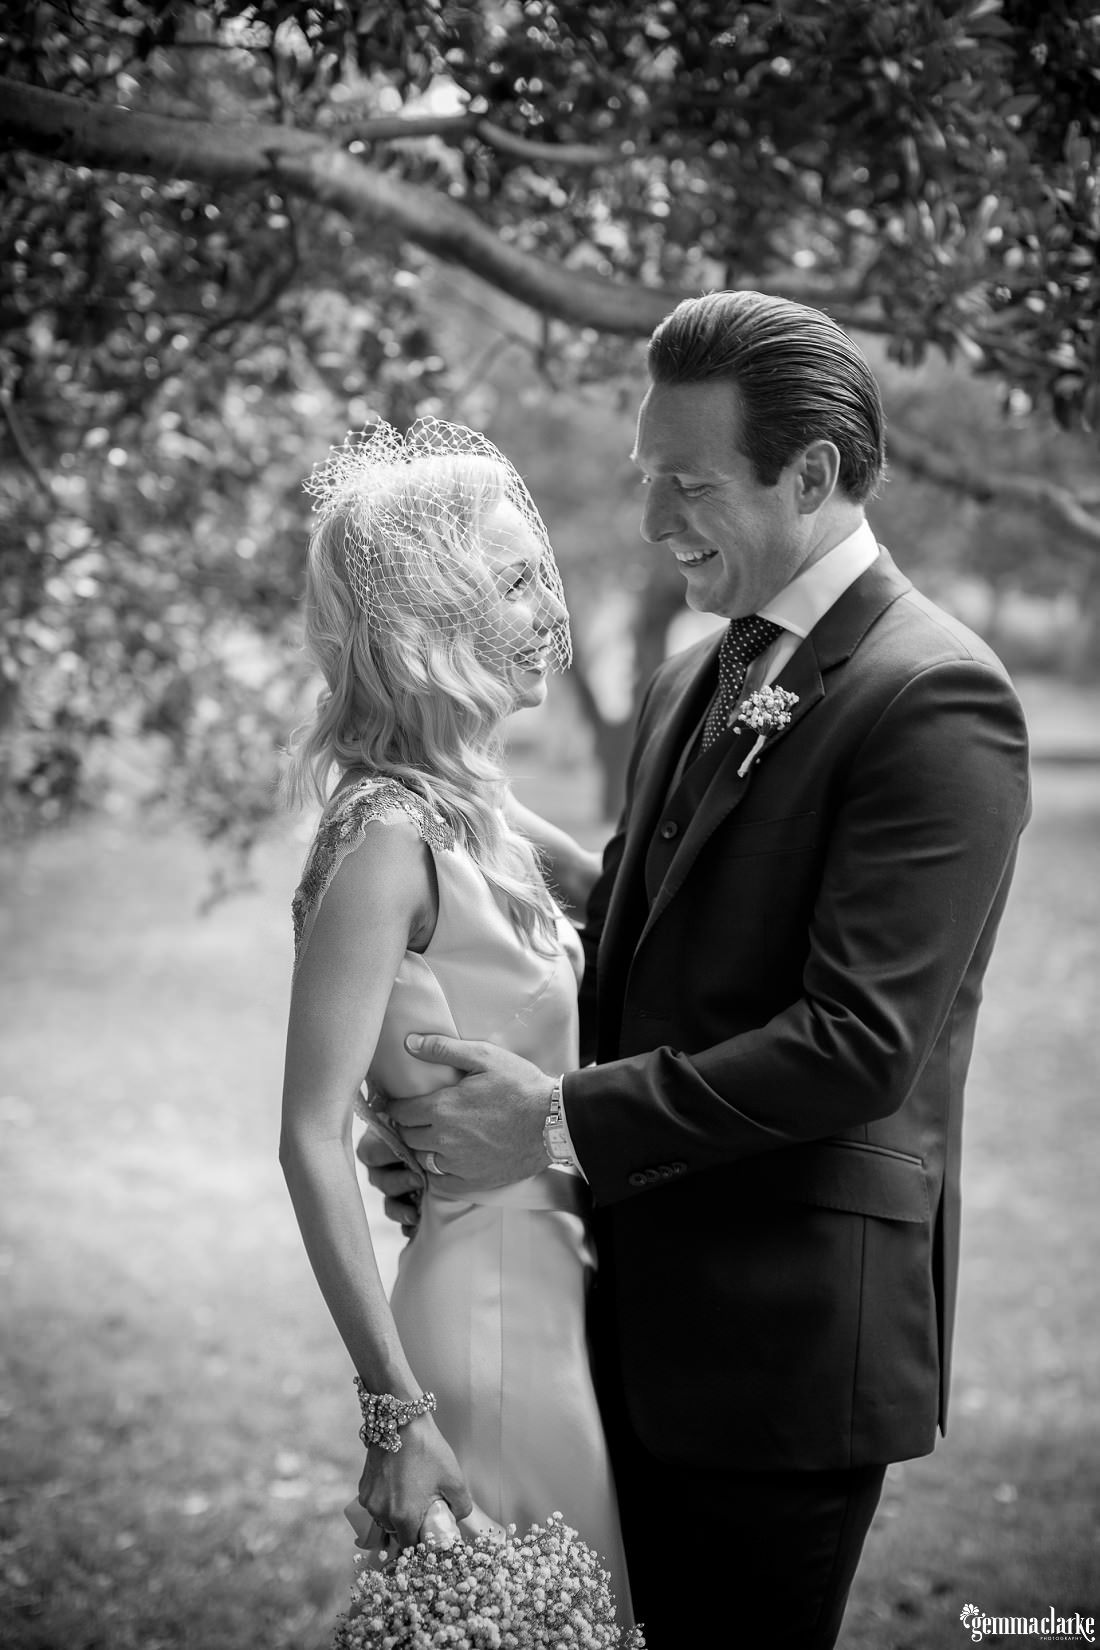 gemma-clarke-photography_watsons-bay-wedding_dog-bridesmaid_kristyl-and-ben_0057